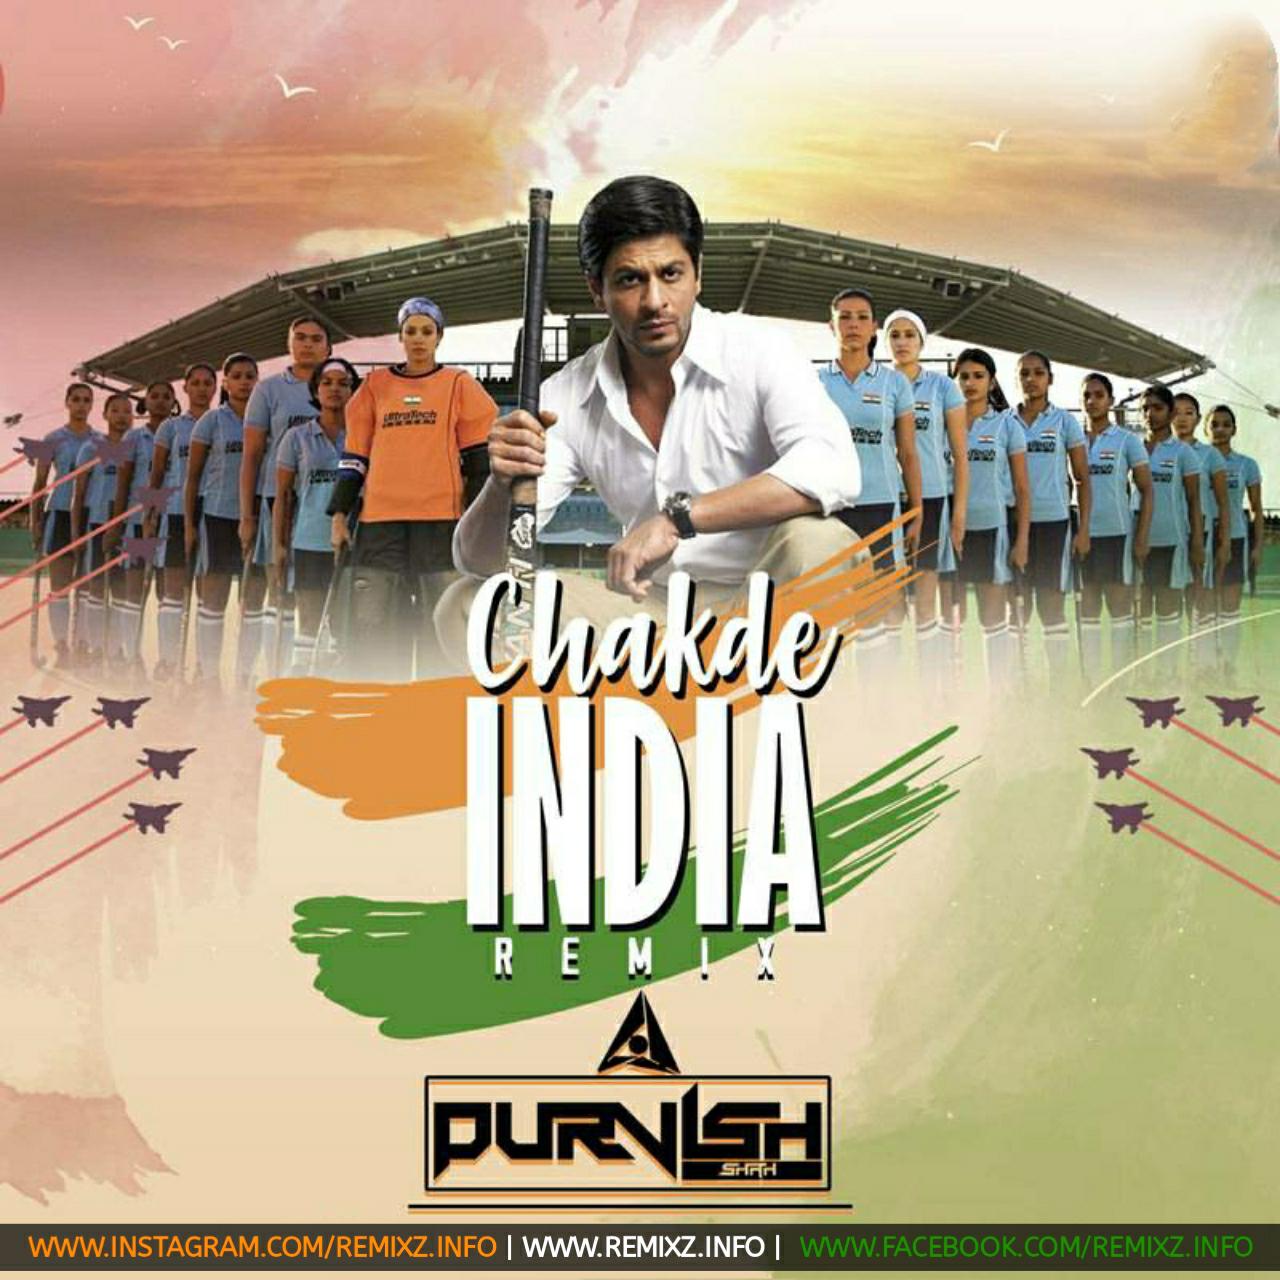 chak-de-india-remix-dj-purvish.jpg